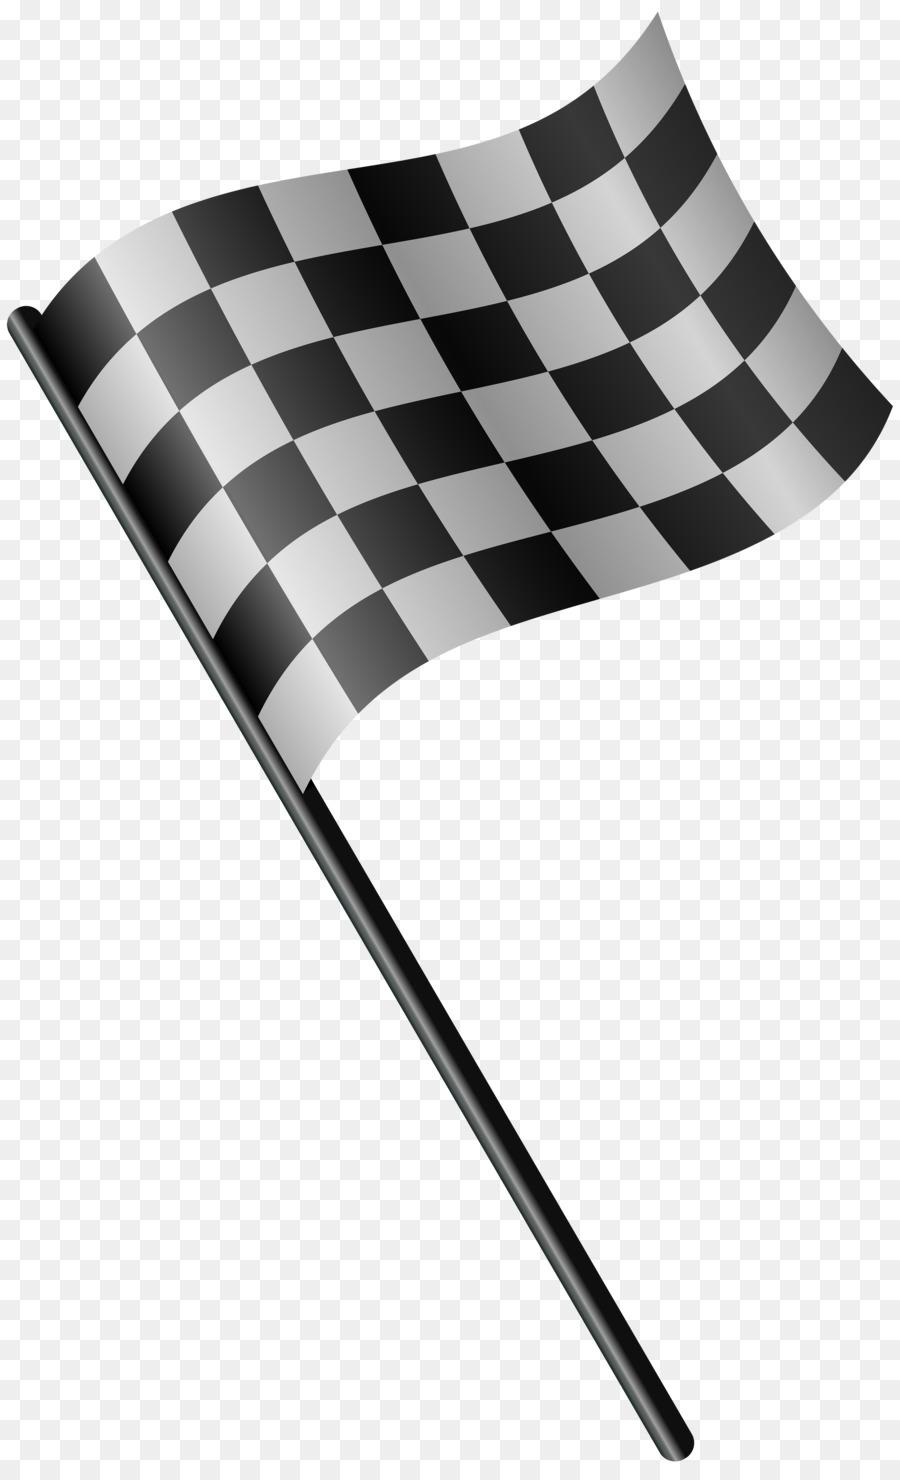 Racing Flags Clip Art